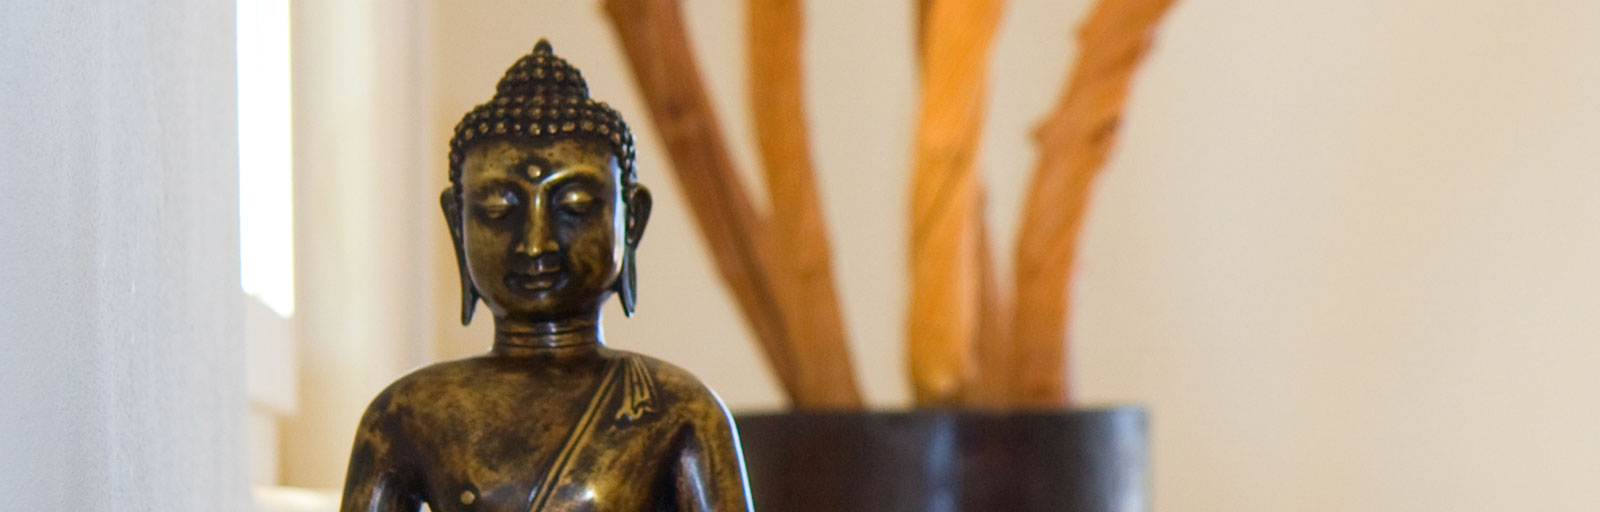 Wellness & Yoga Retreats in Baja, Mexico: Buddha Sculpture